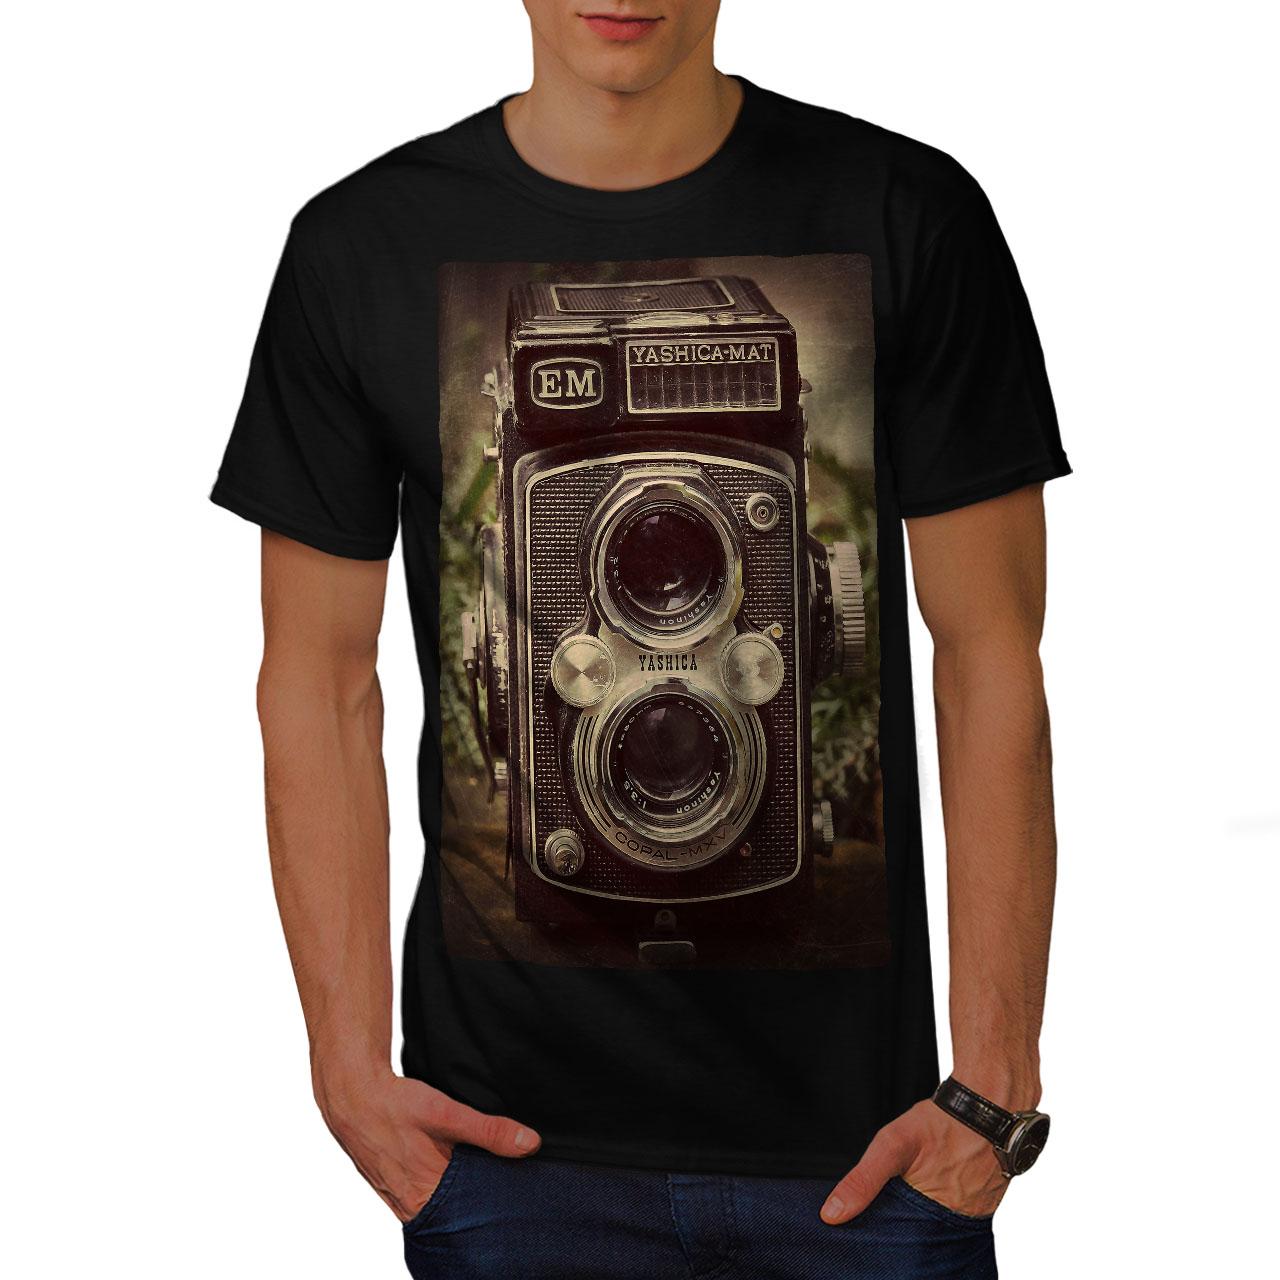 Wellcoda-Old-Foto-Camera-Mens-T-shirt-Retro-Graphic-Design-Printed-Tee thumbnail 3